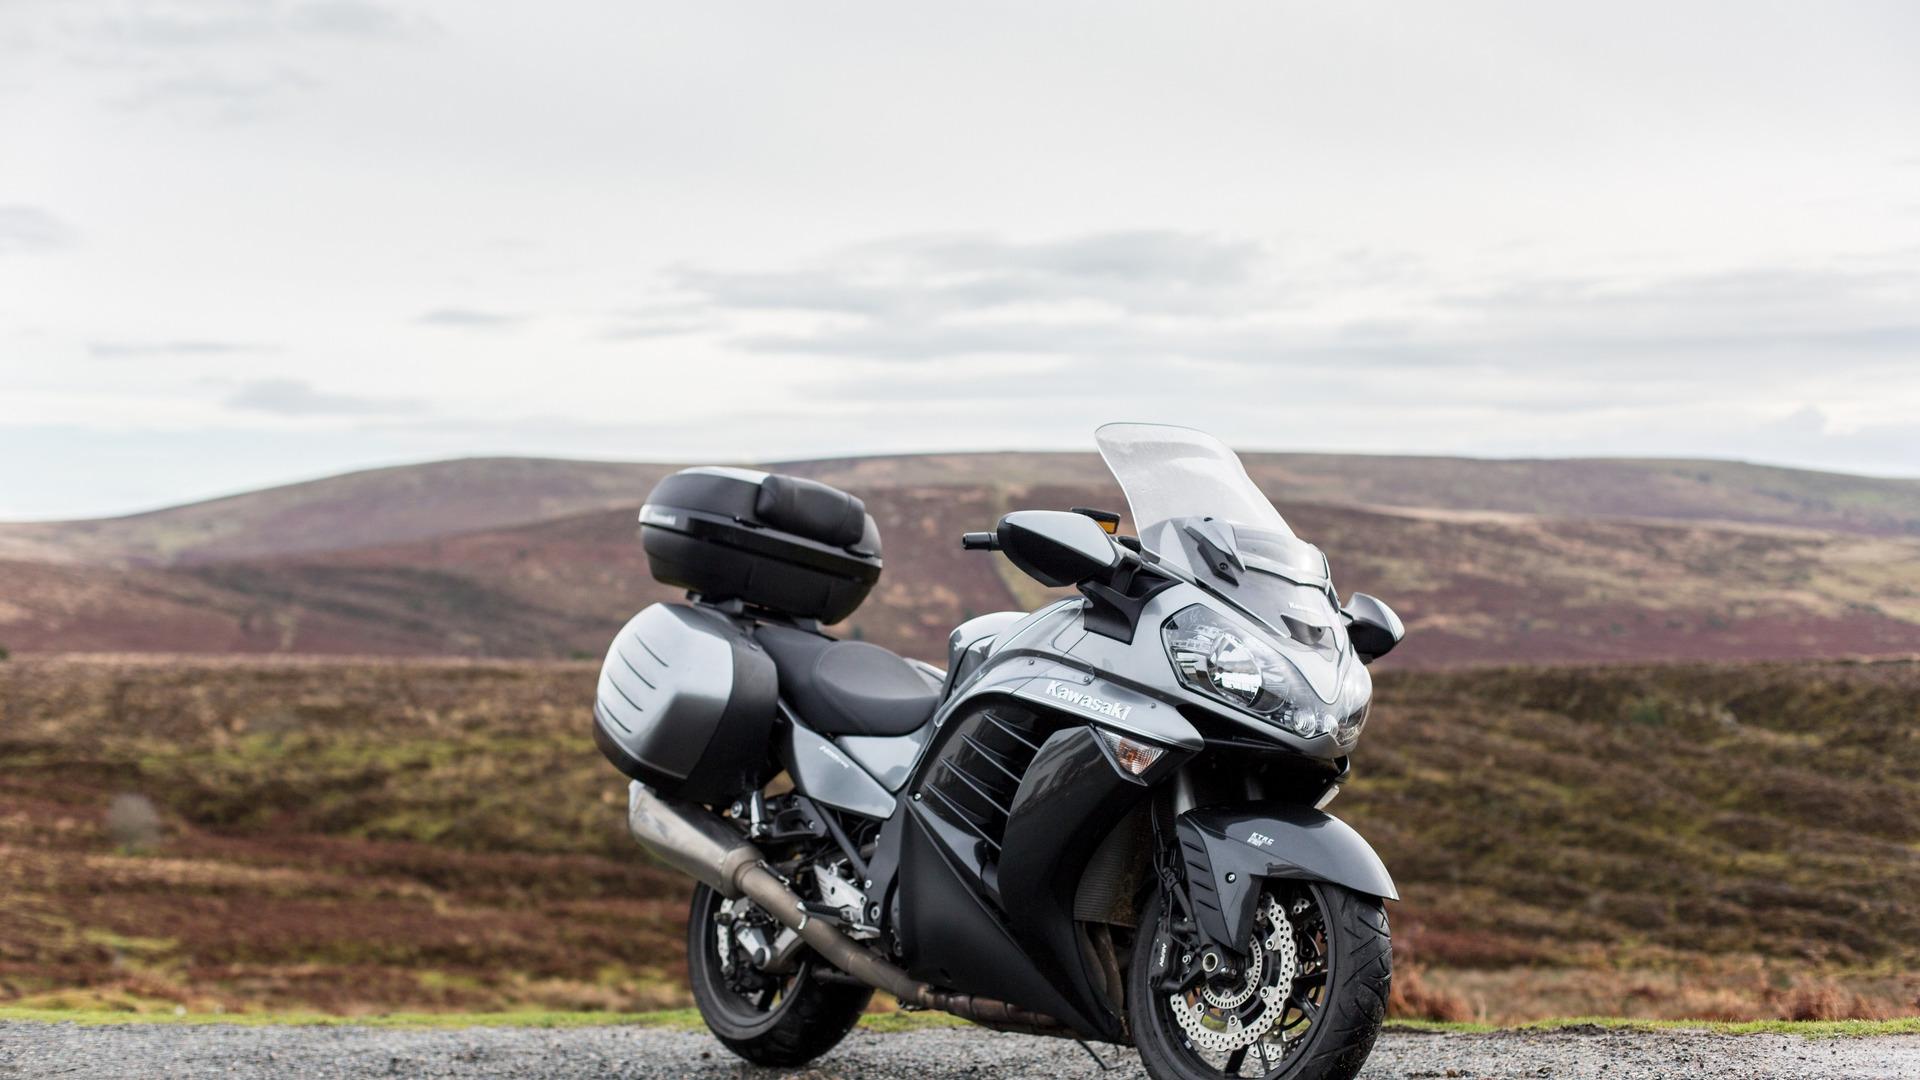 Тест-драйв мотоцикла Yamaha FJR1300